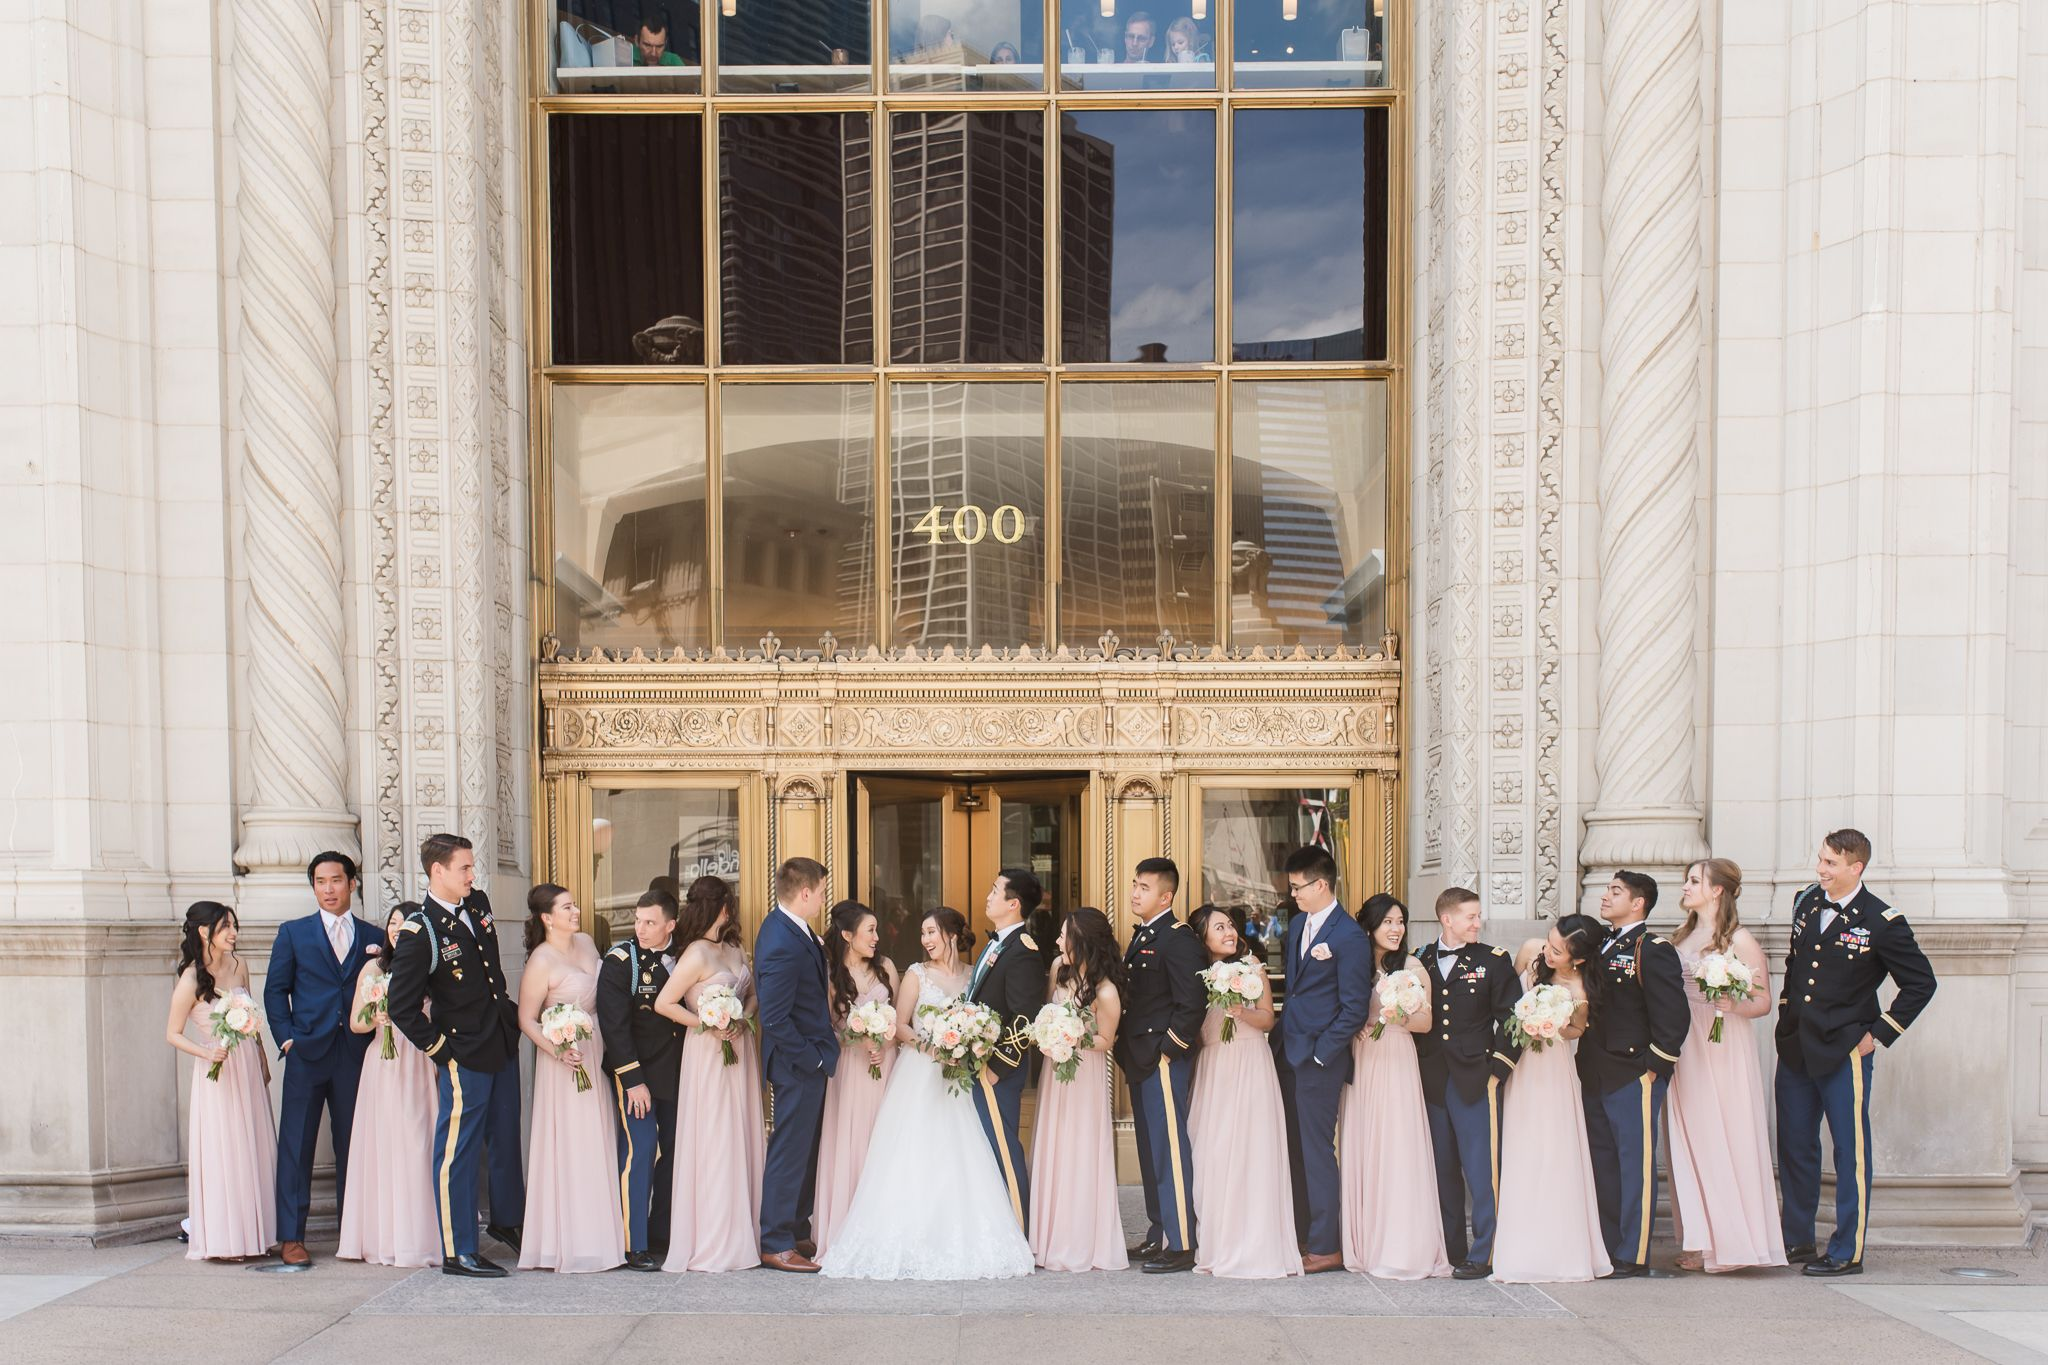 Chicago Wedding Photographer Ashley And Mike Part 1 Indianapolis Wedding Photographer Rakoteet Photography Indianapolis Wedding Photographer Chicago Wedding Ballroom Wedding